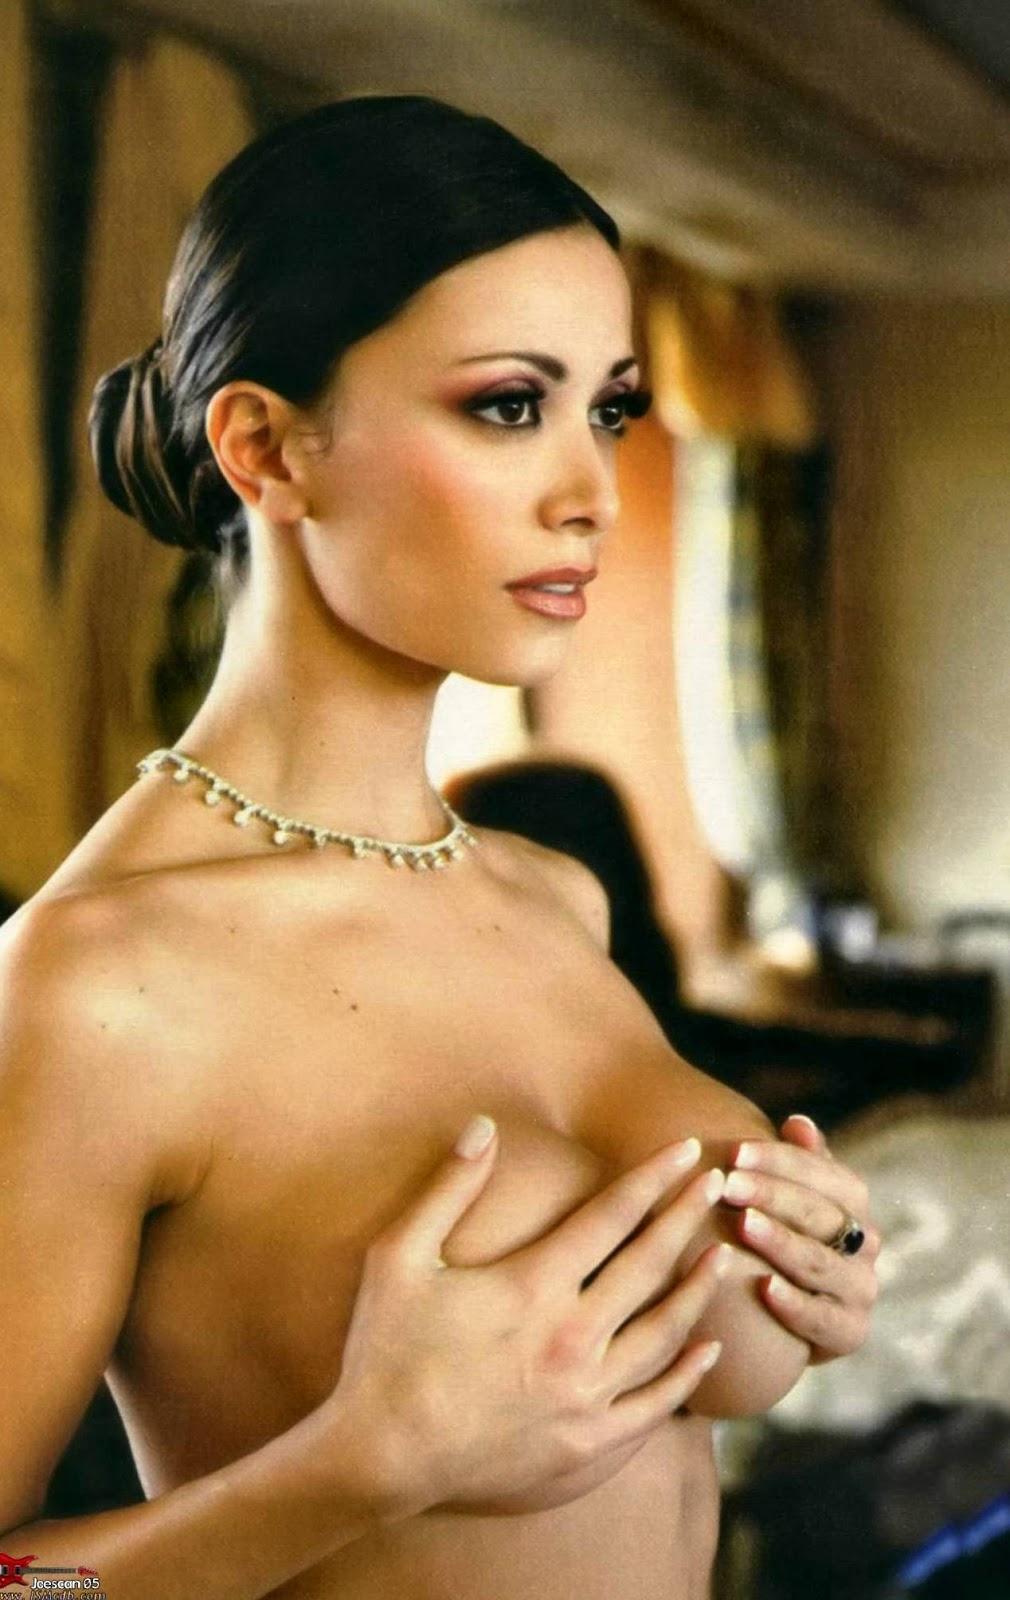 Sara Varone Tits 17